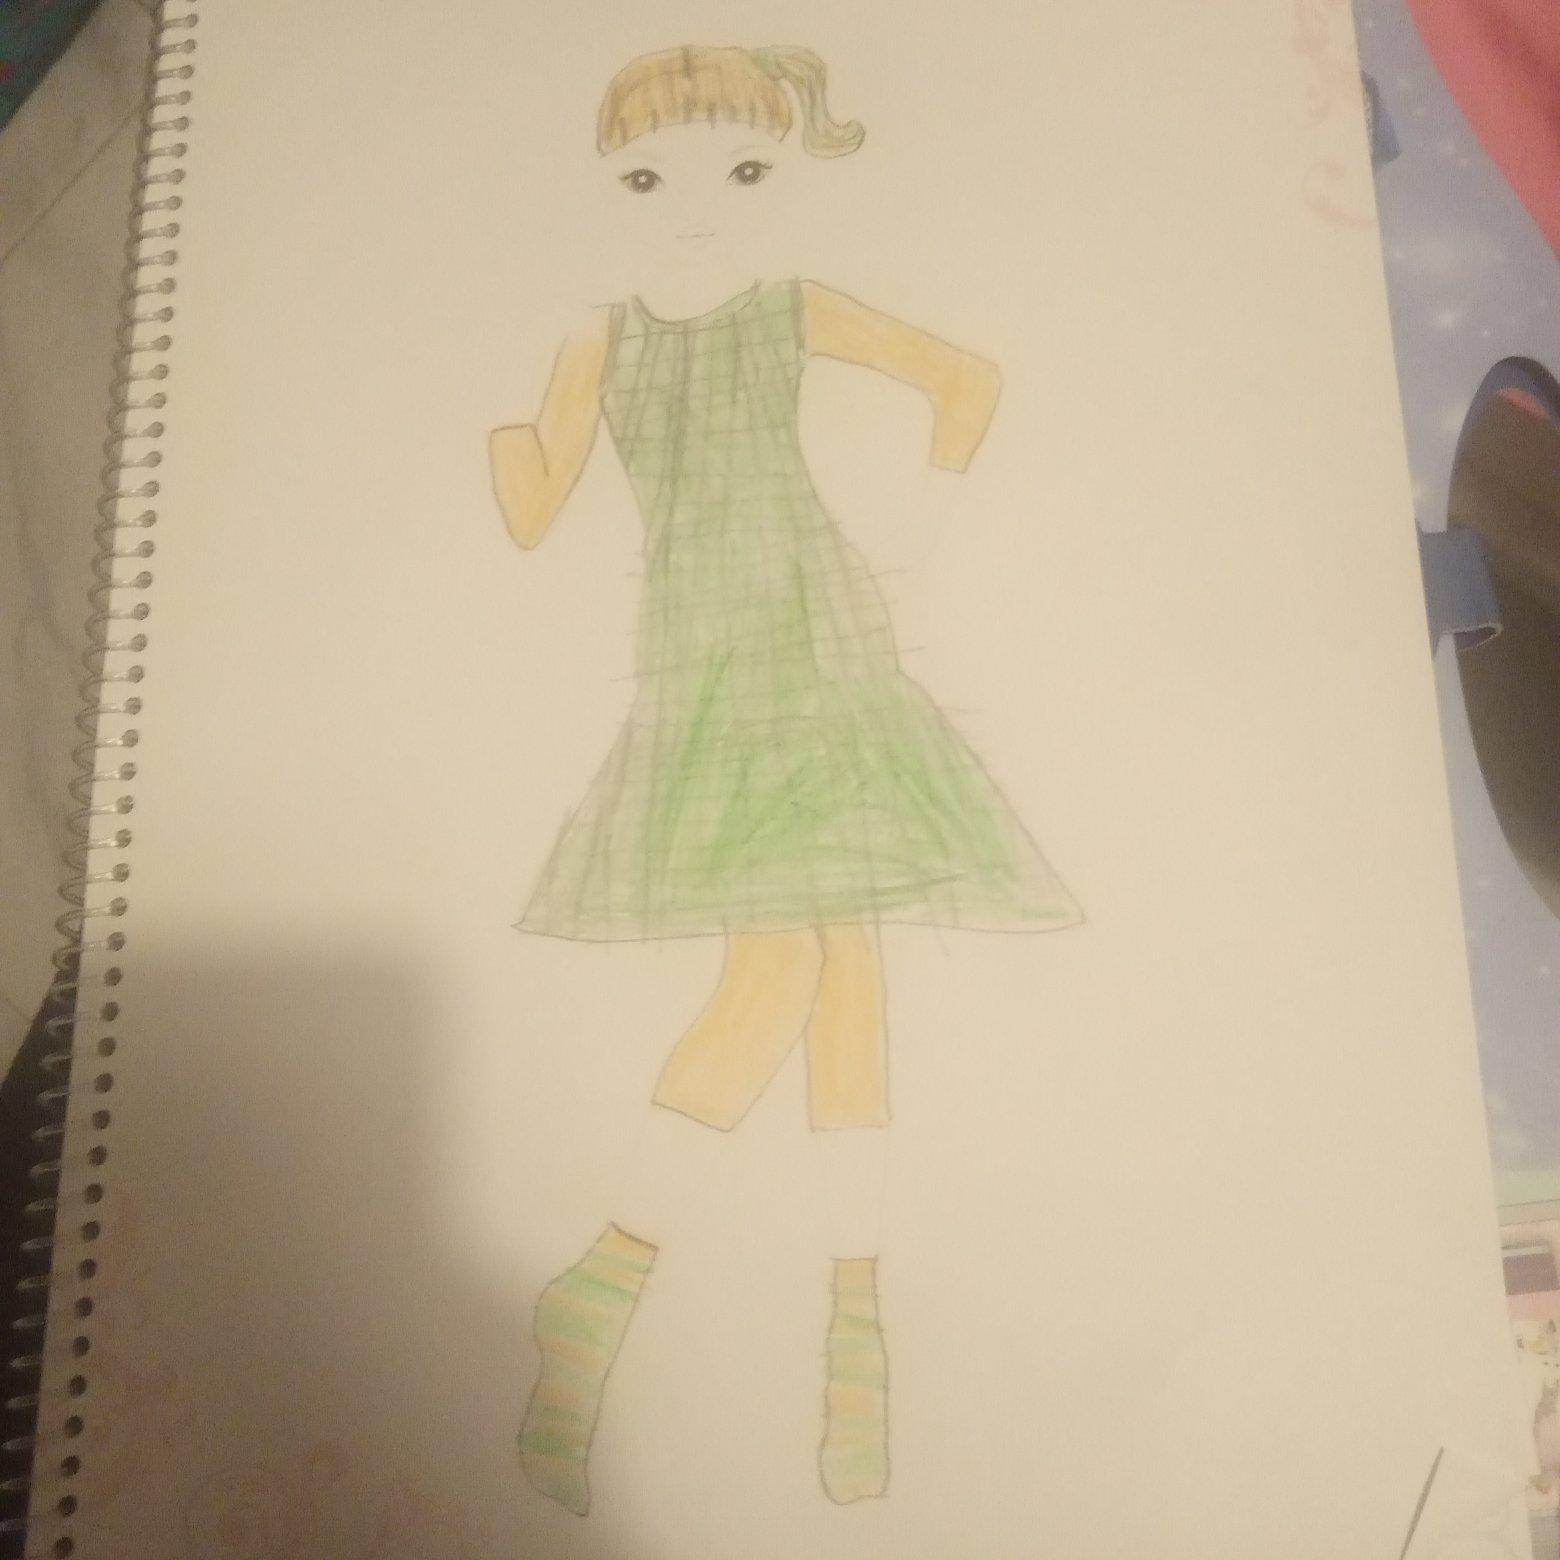 Emma Y., 11years, from España